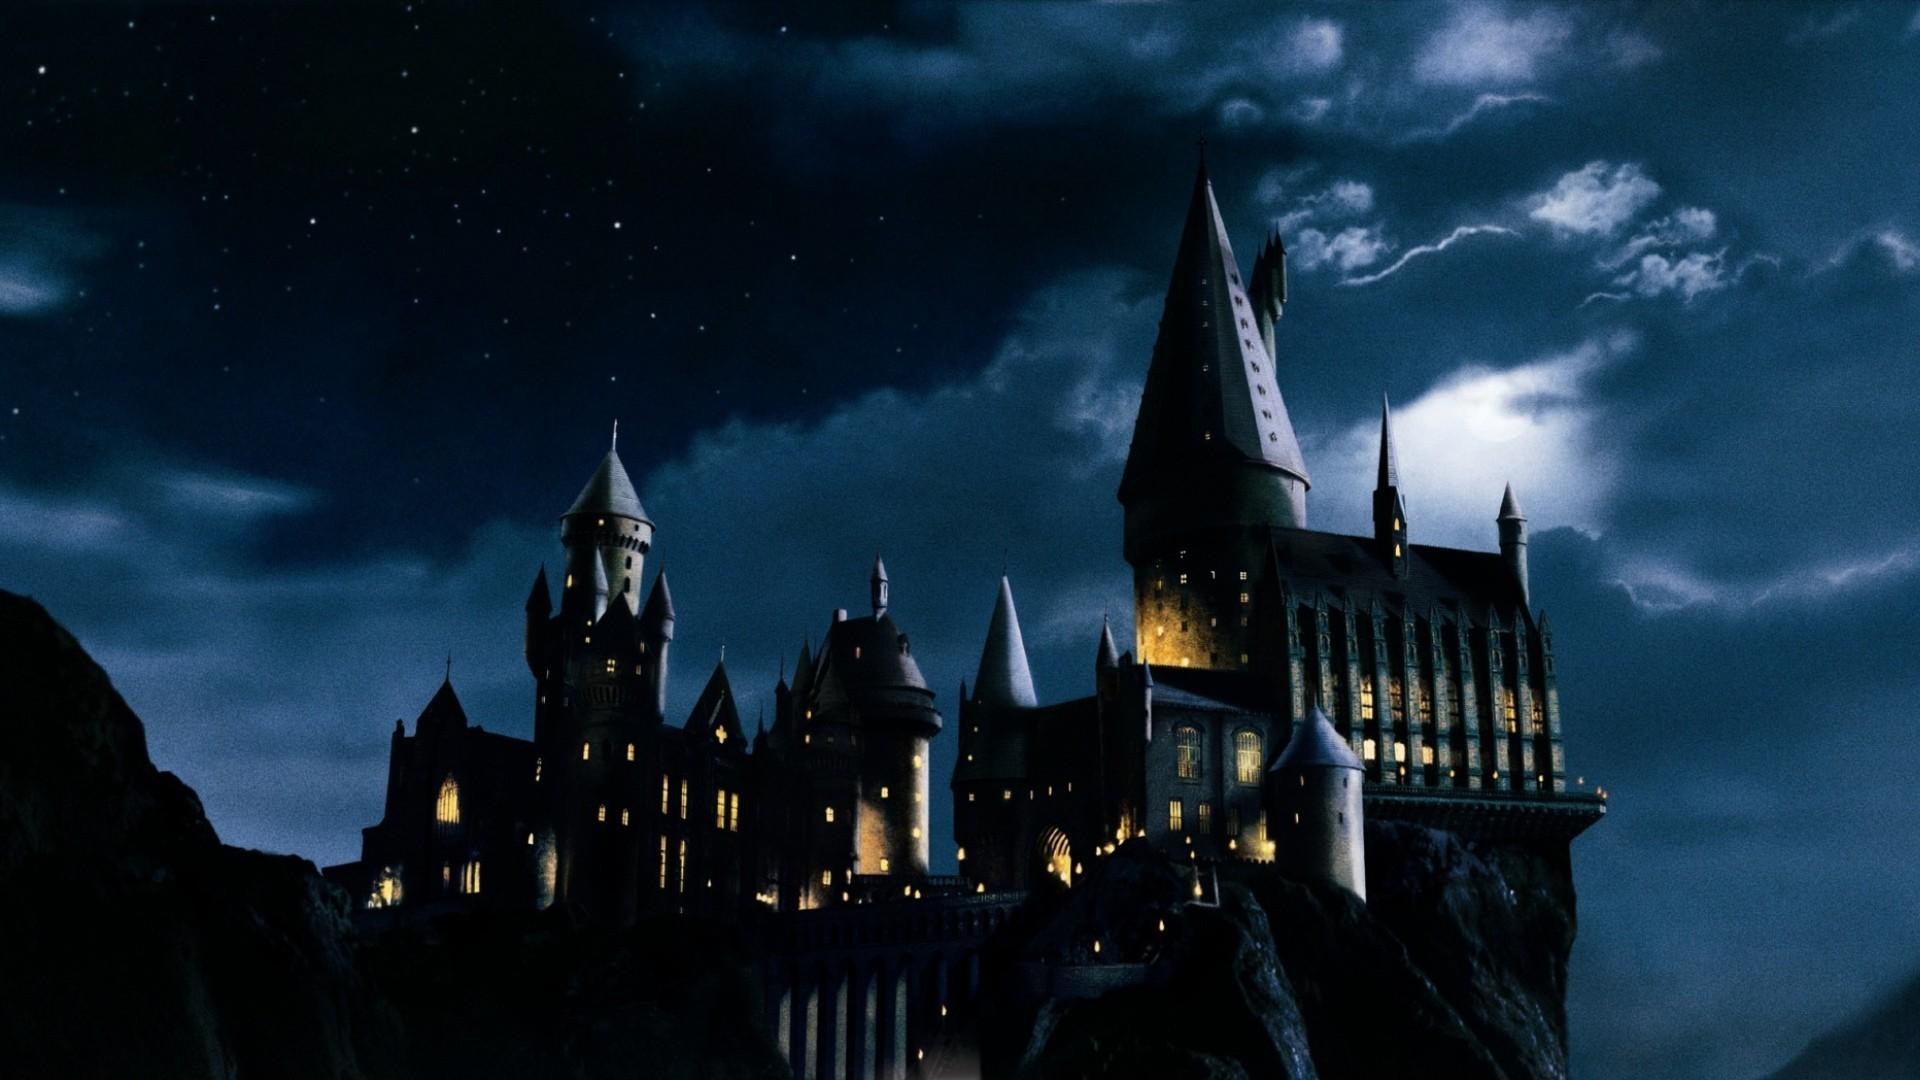 harry potter wallpaper hogwarts – Wallpaper